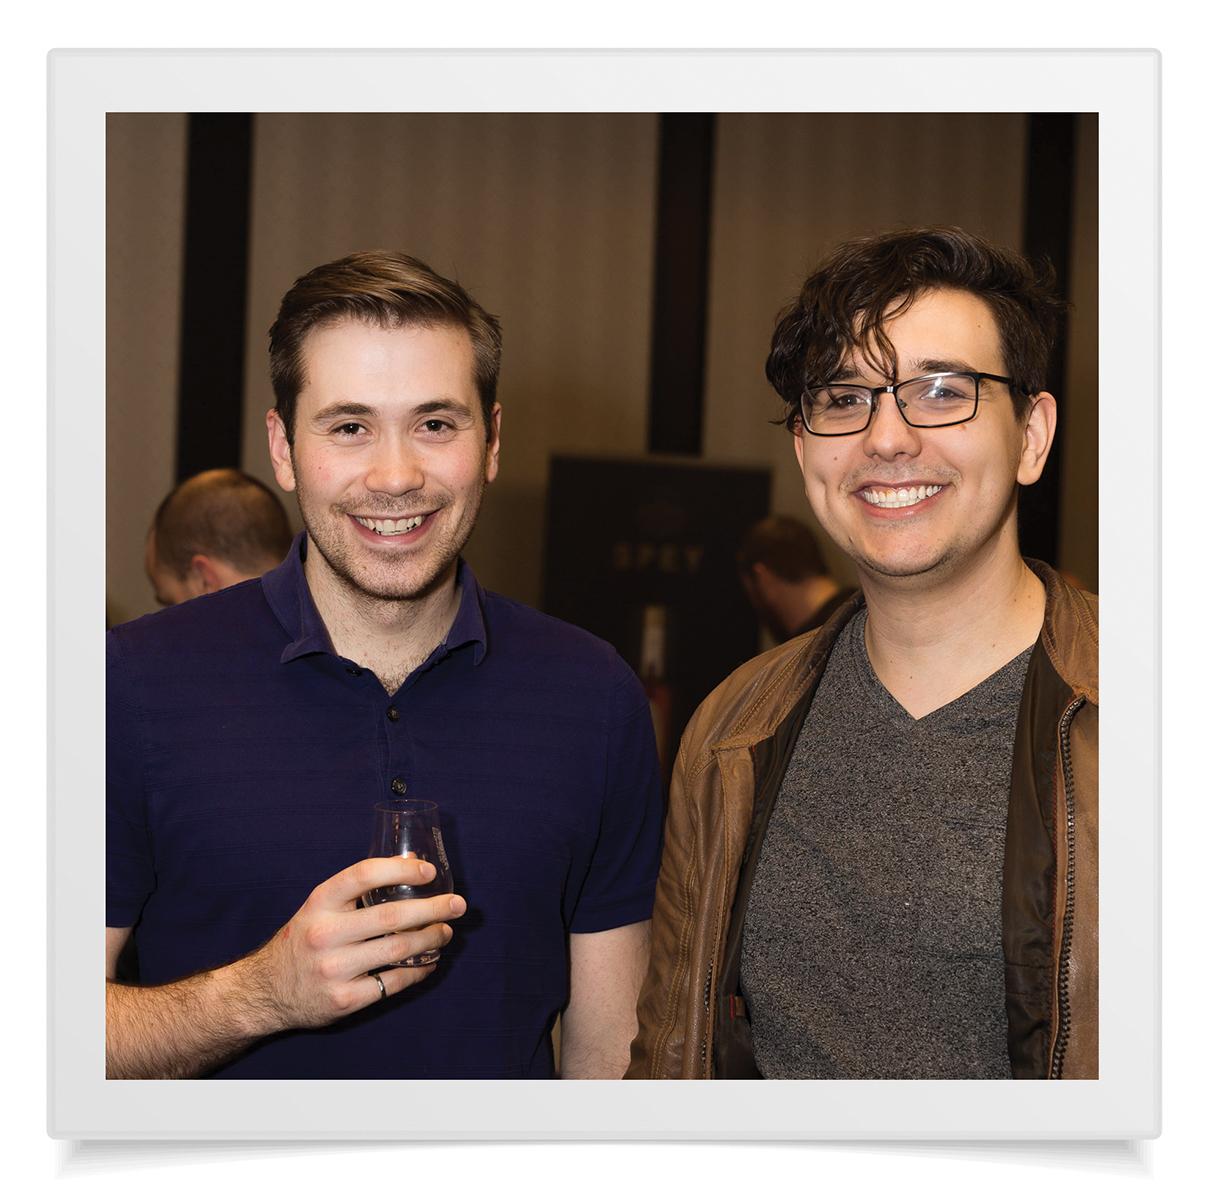 People_Party-Crasher_MS2018_Jacob_Alex